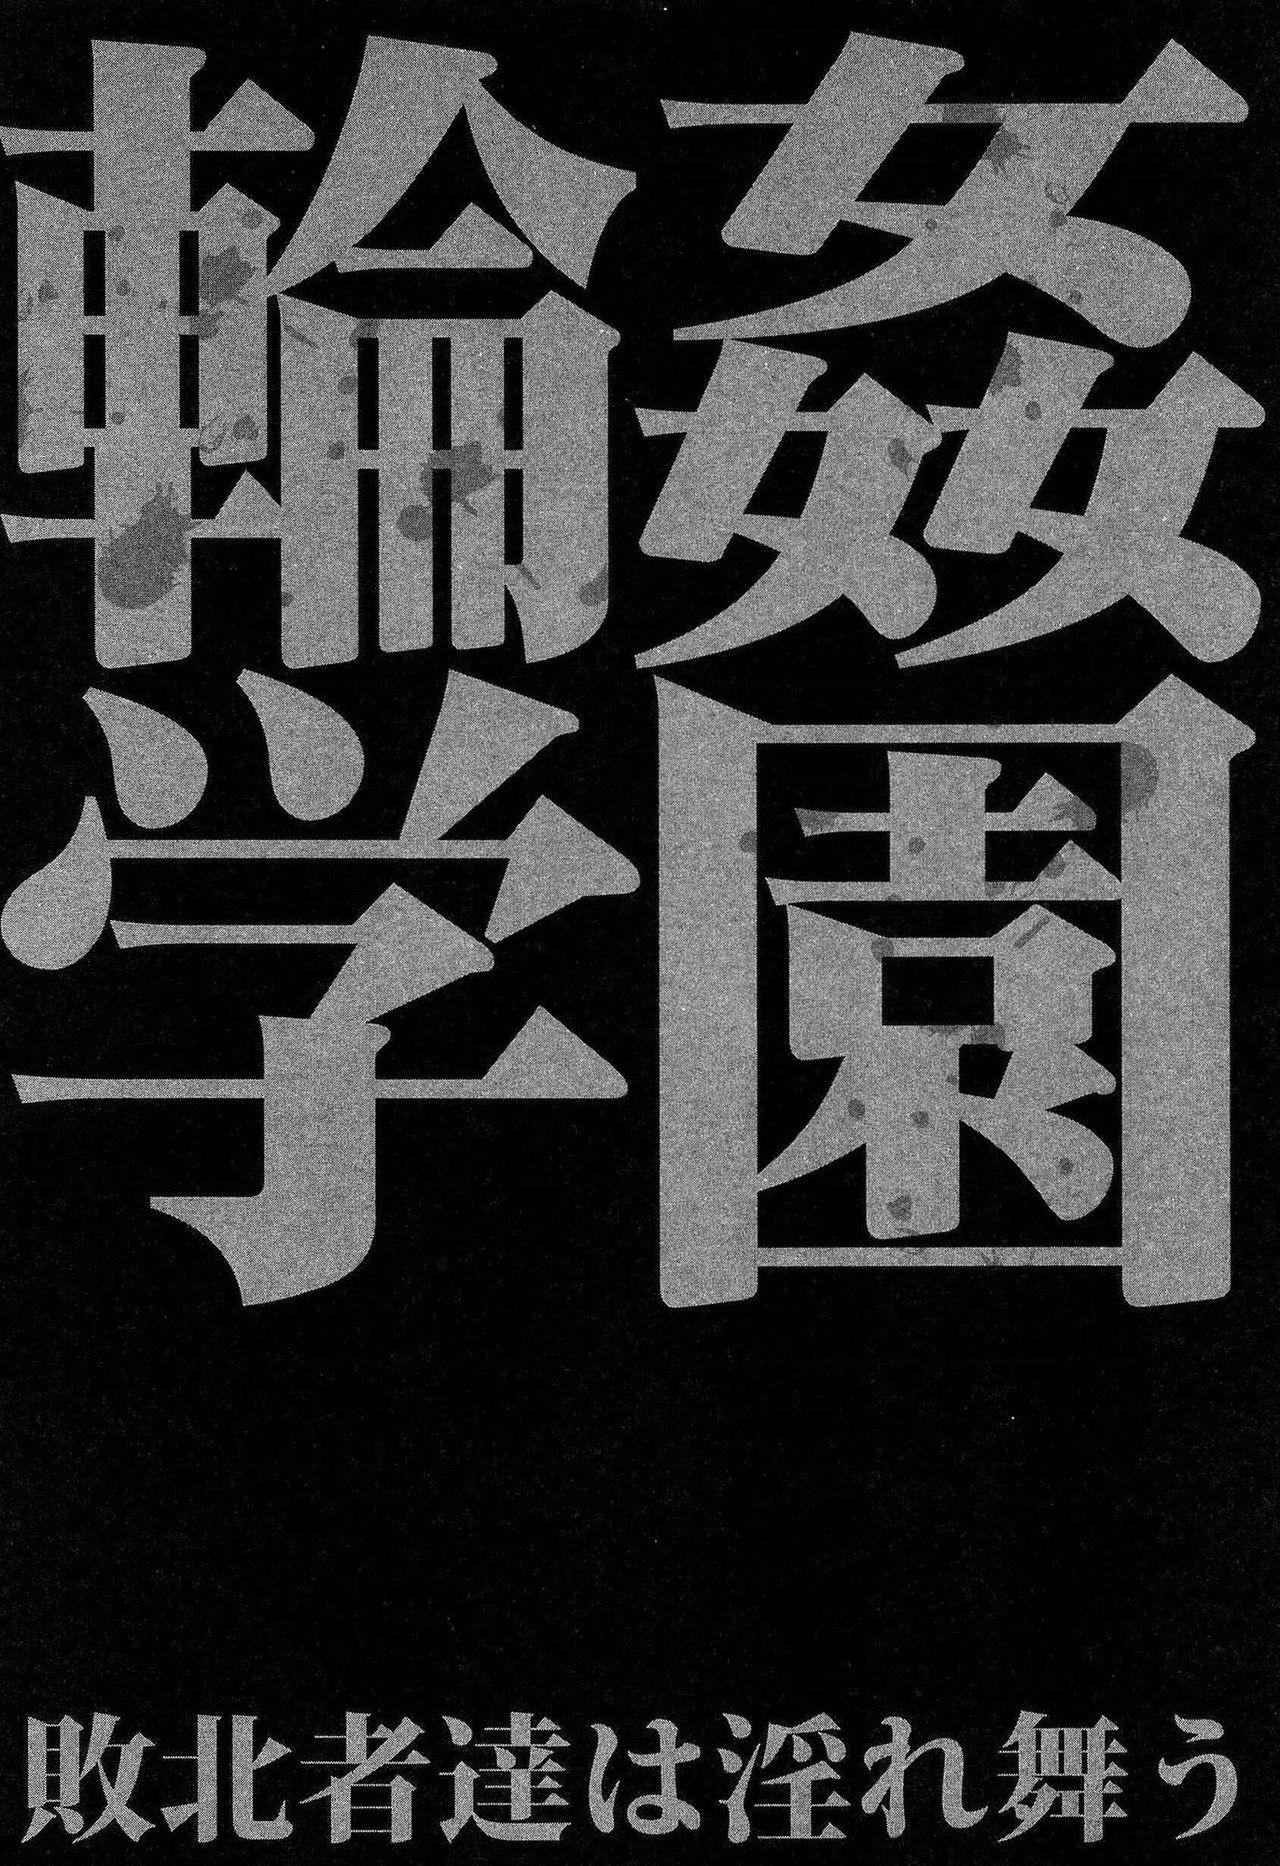 [Chiyou Yoyuchi] Rinkan Gakuen ~Haibokusha-tachi wa Midaremau~   Gang Rape School: The Losers Dance Indecently [English] 187